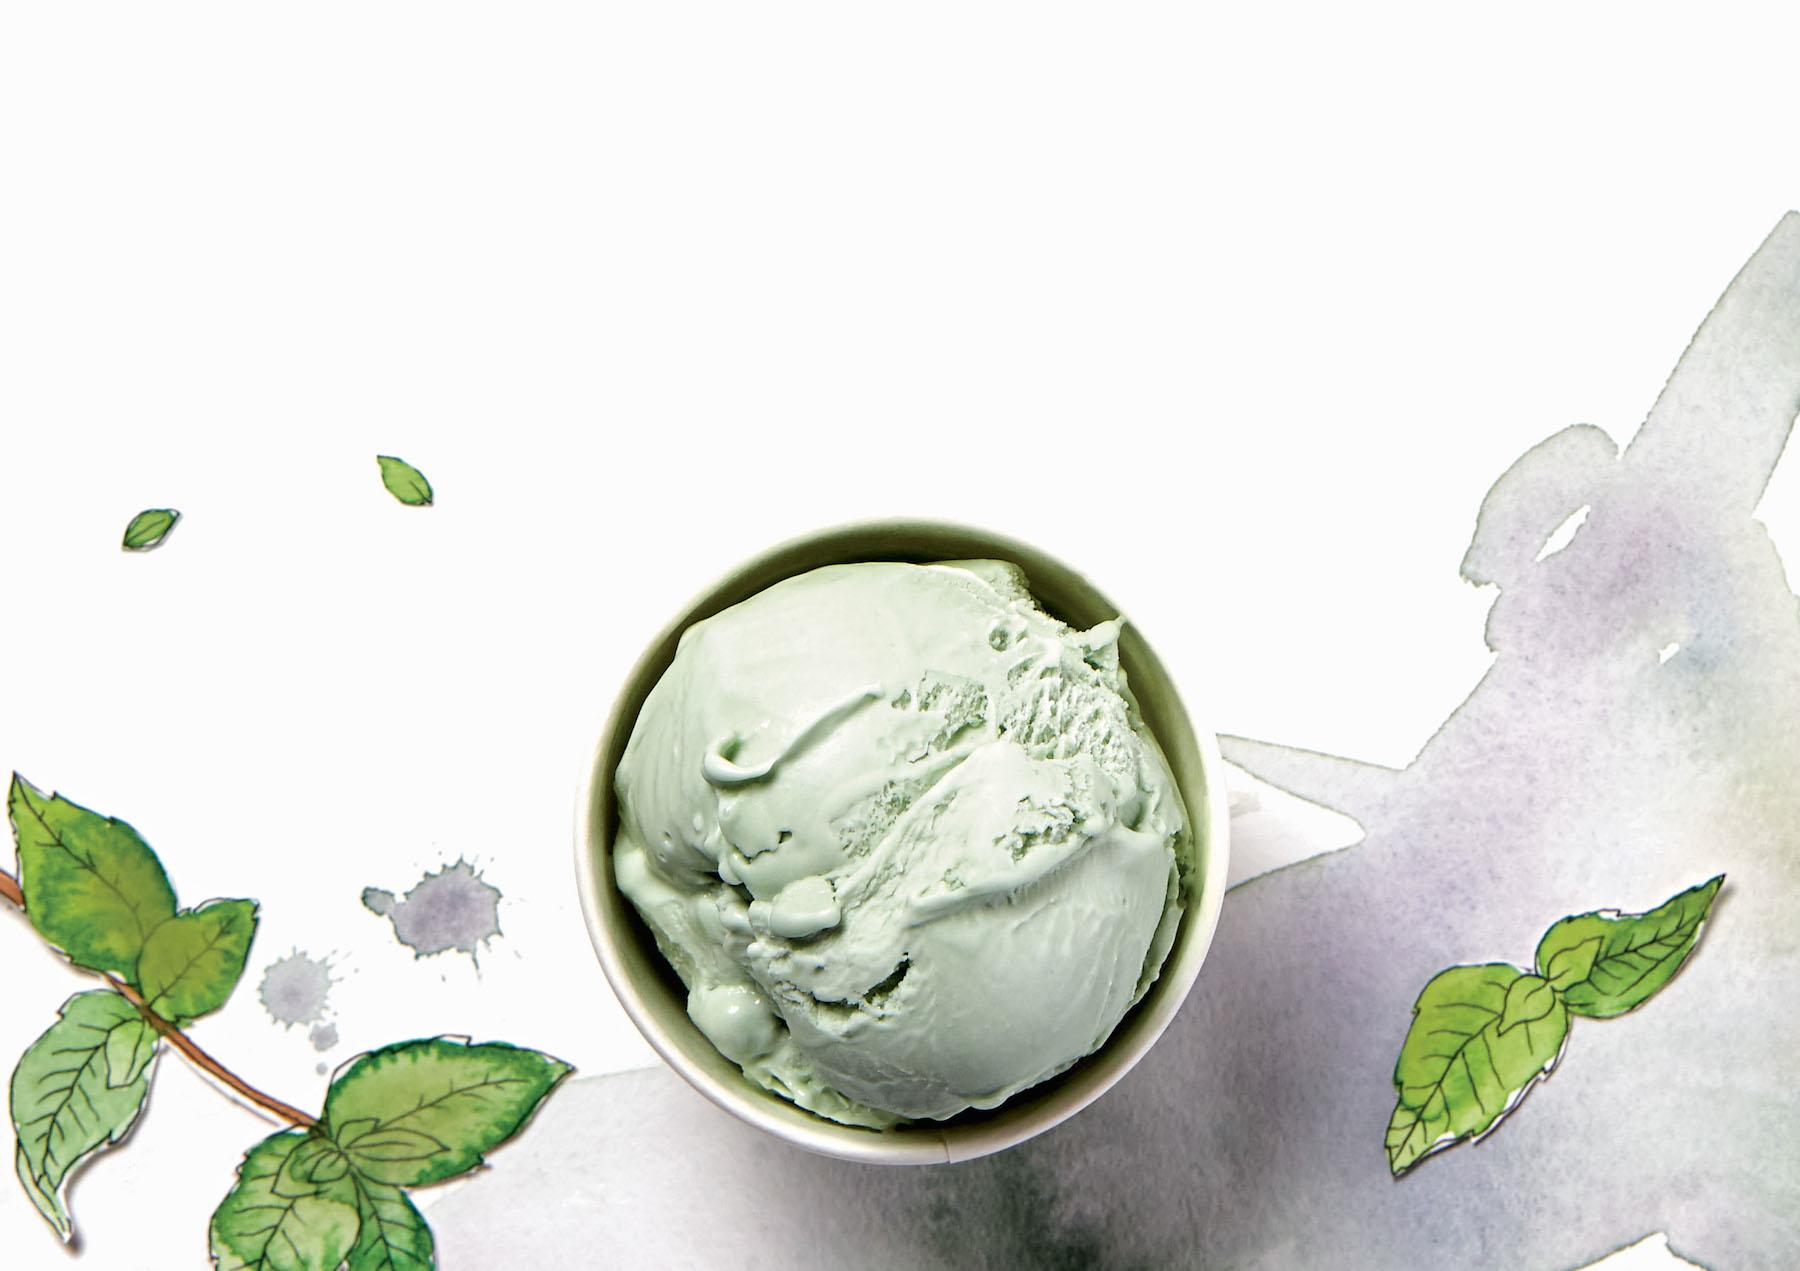 Blue apron techcrunch - Recipe A Cool And Creamy Peppermint Ice Cream